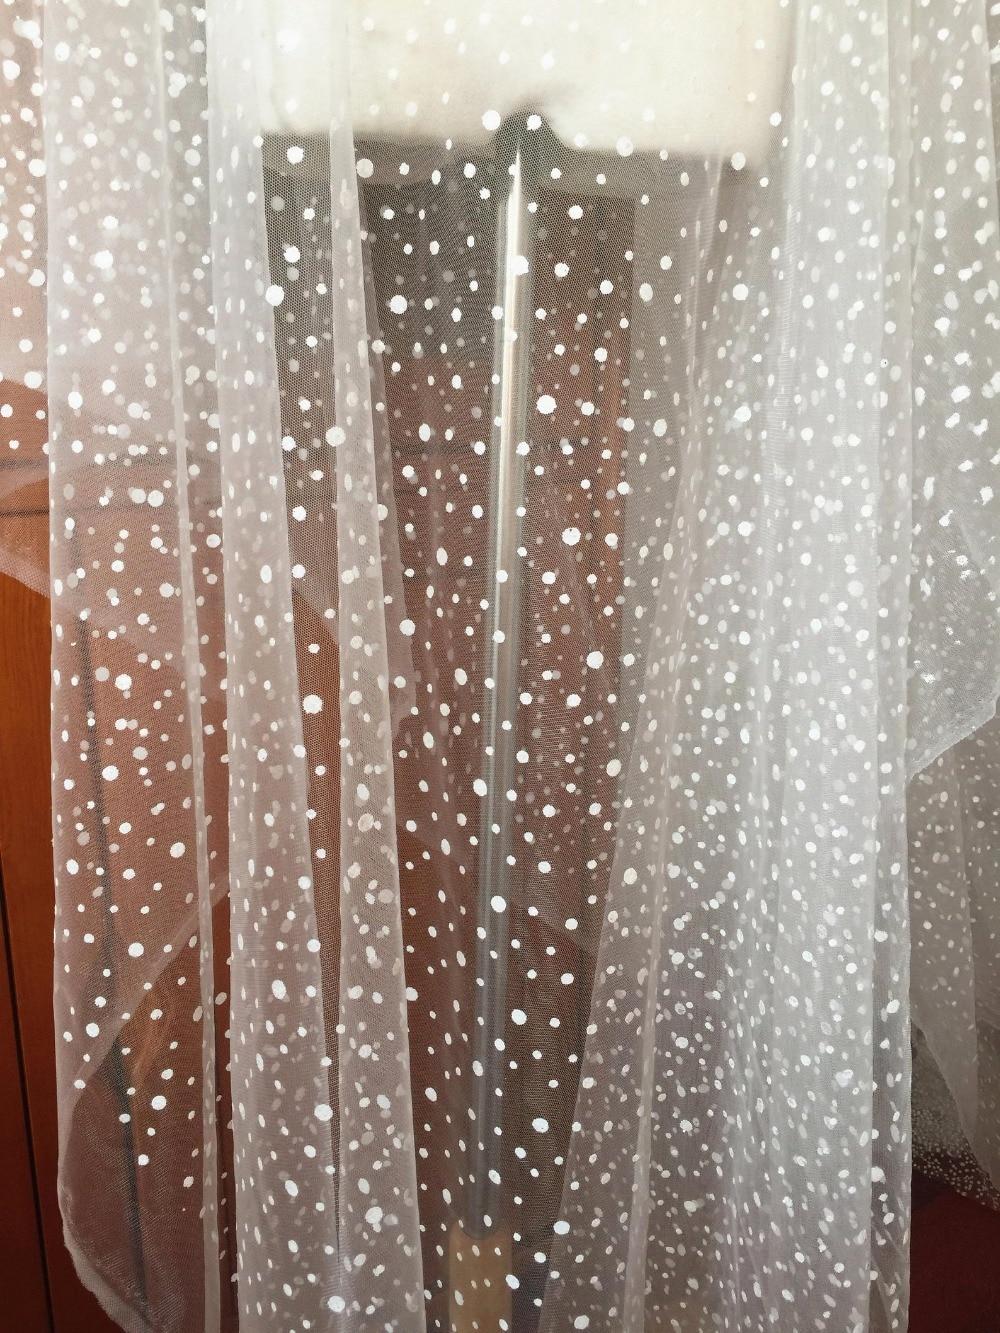 5 yardas de purpurina Polka punteado de tela de encaje de malla de Tul blanco para velo de novia capa Bolero accesorios vestido de boda forro de tela